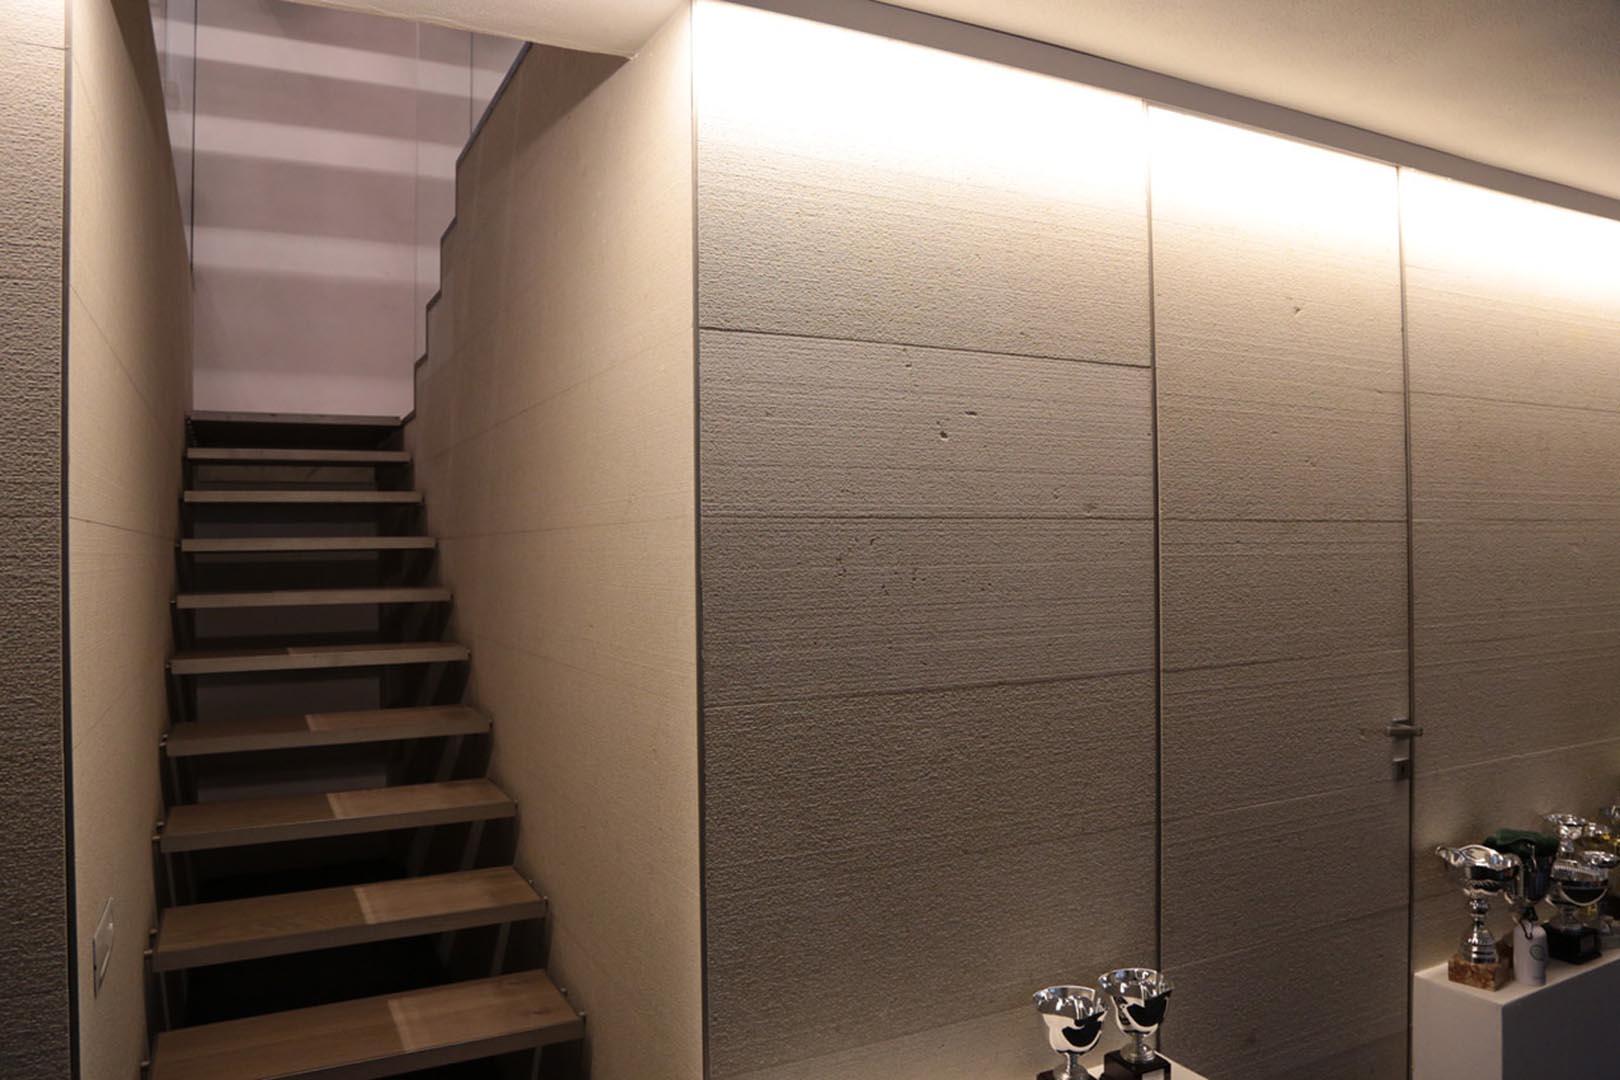 Villa-Parma-rivestimento-pareti-interne-02